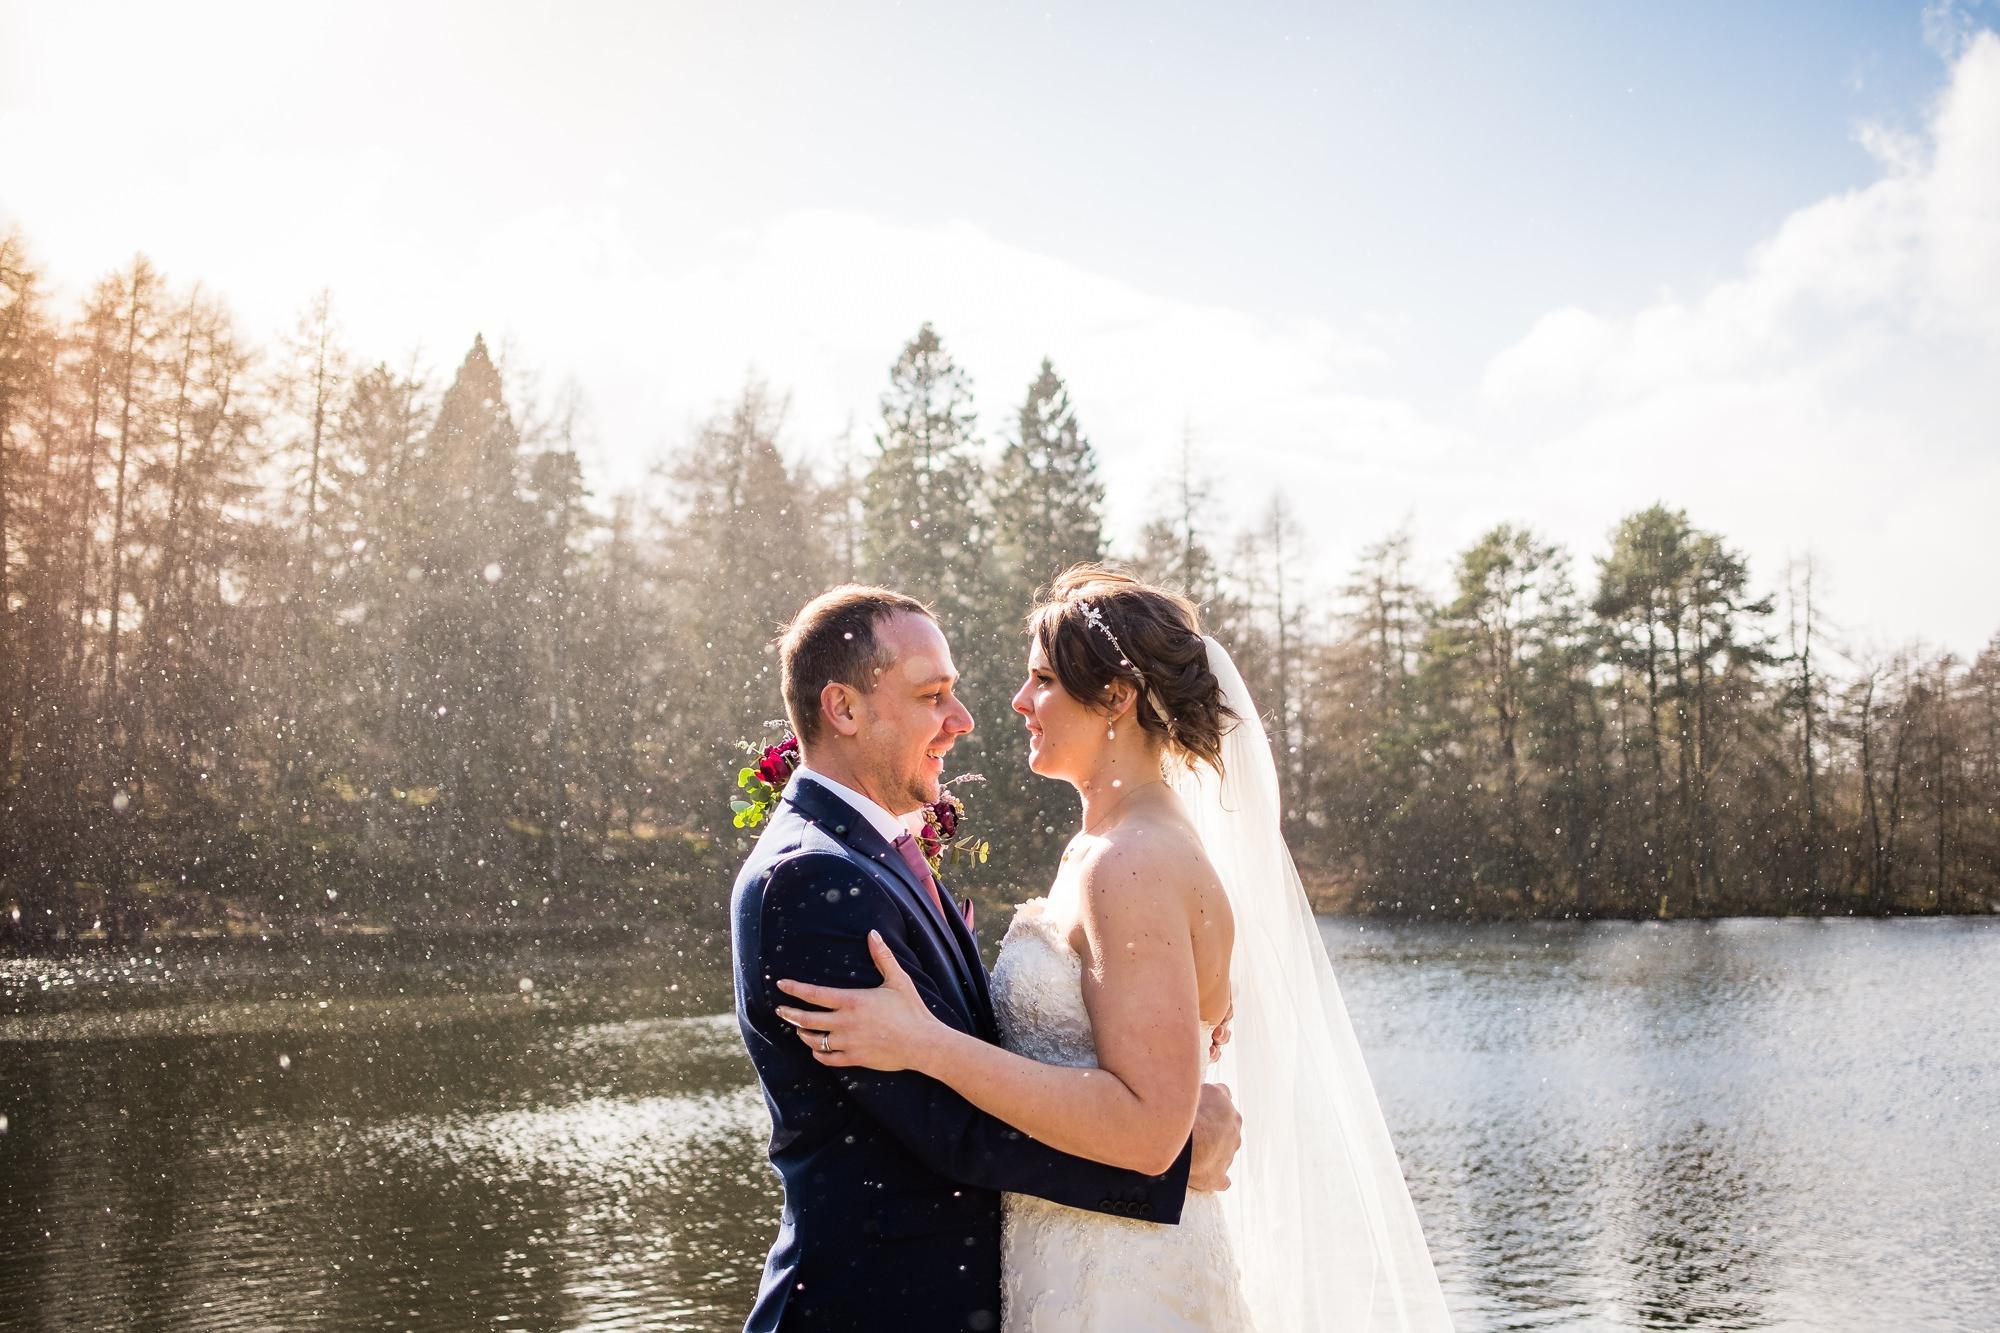 Best-Wedding-Photography-2018-Lancashire_0167.jpg